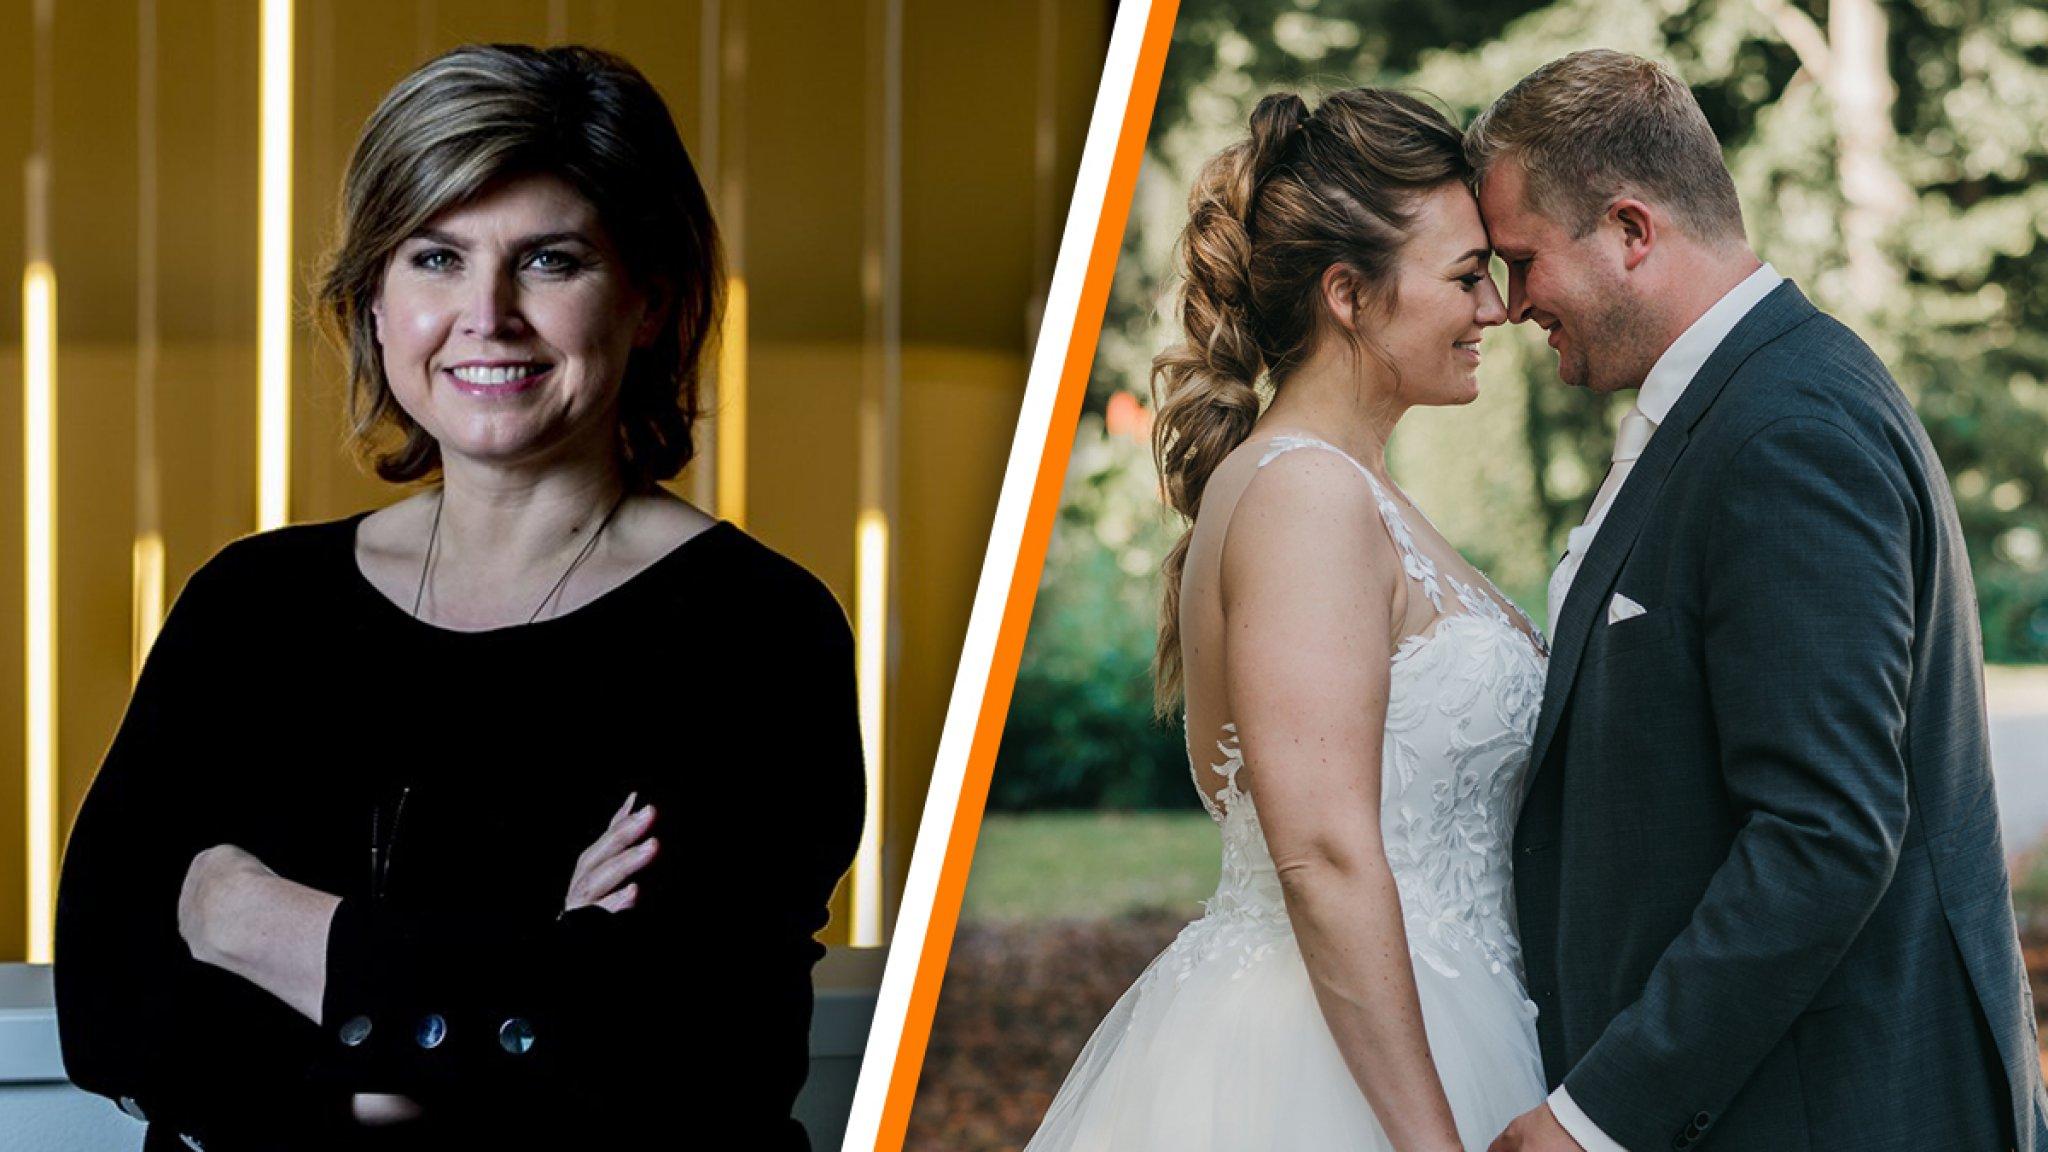 'Married at First Sight verliest in rap tempo zijn glans' - RTL Nieuws